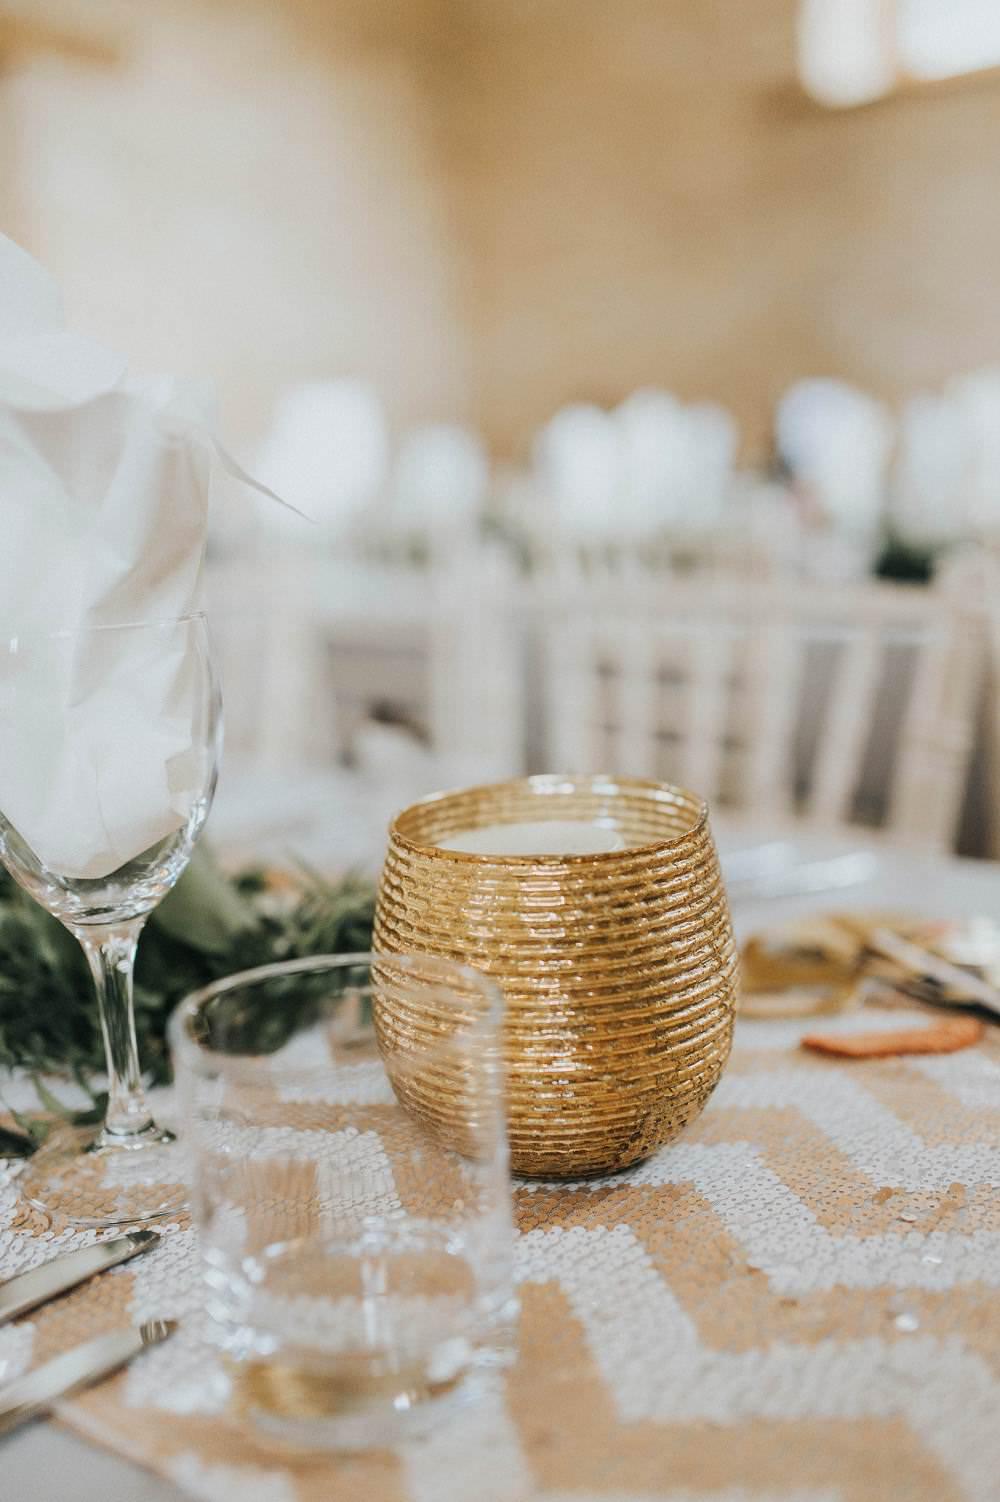 Gold Tea Light Candle Chevron Table Cloth Runner Eucalyptus Boho Greenery Barn Wedding Kerry Diamond Photography